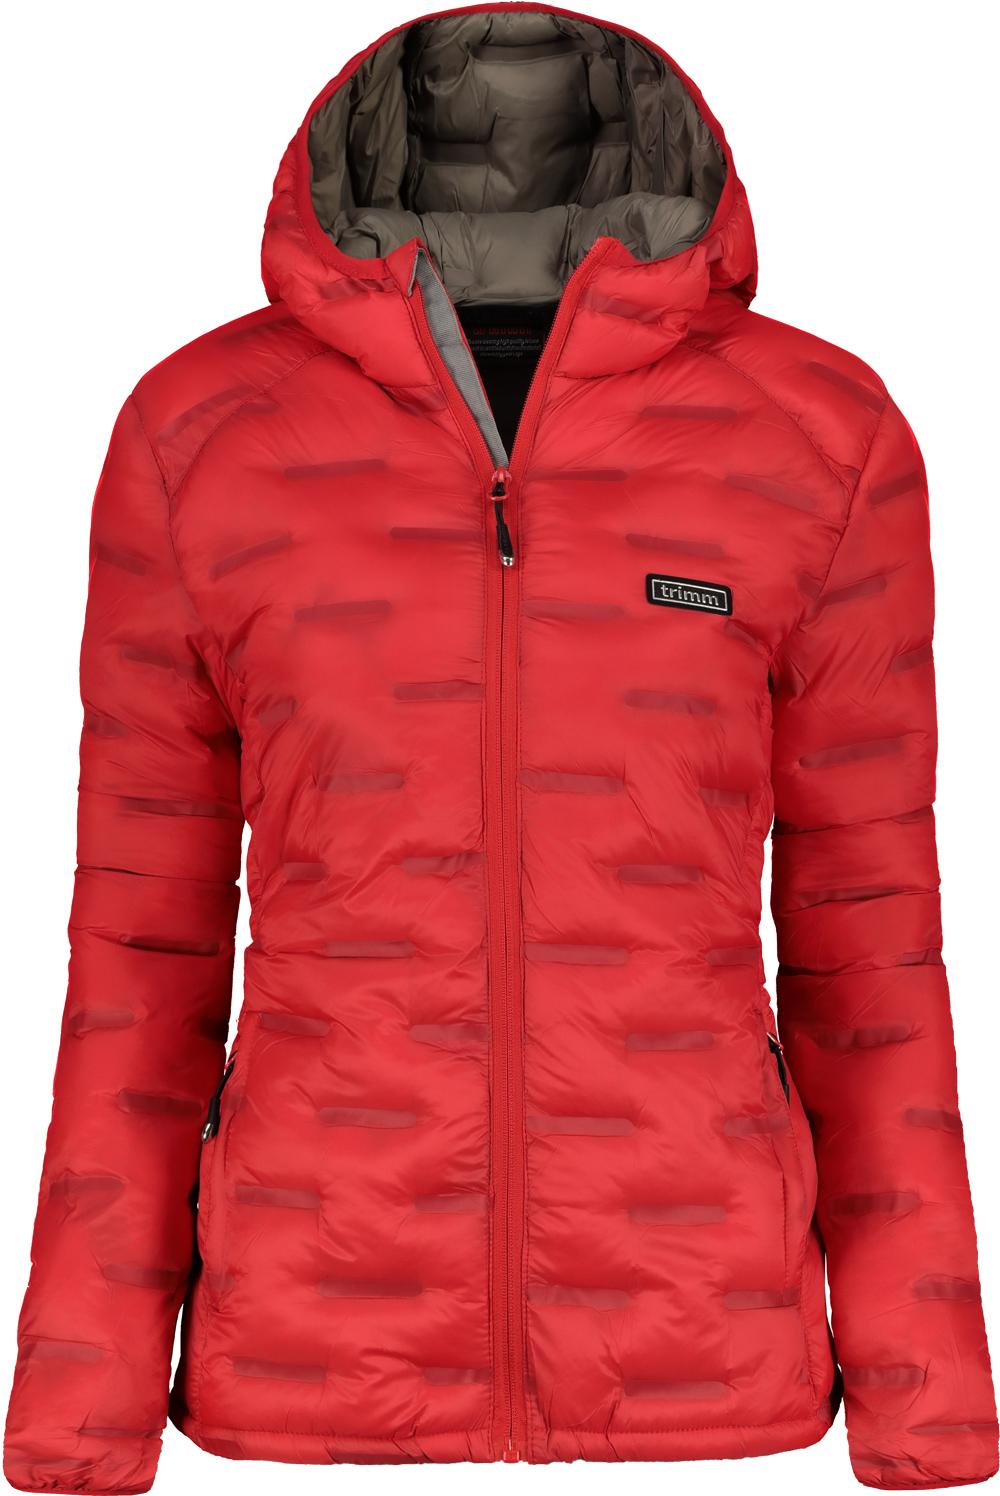 Women's winter sports jacket TRIMM TRAIL LADY